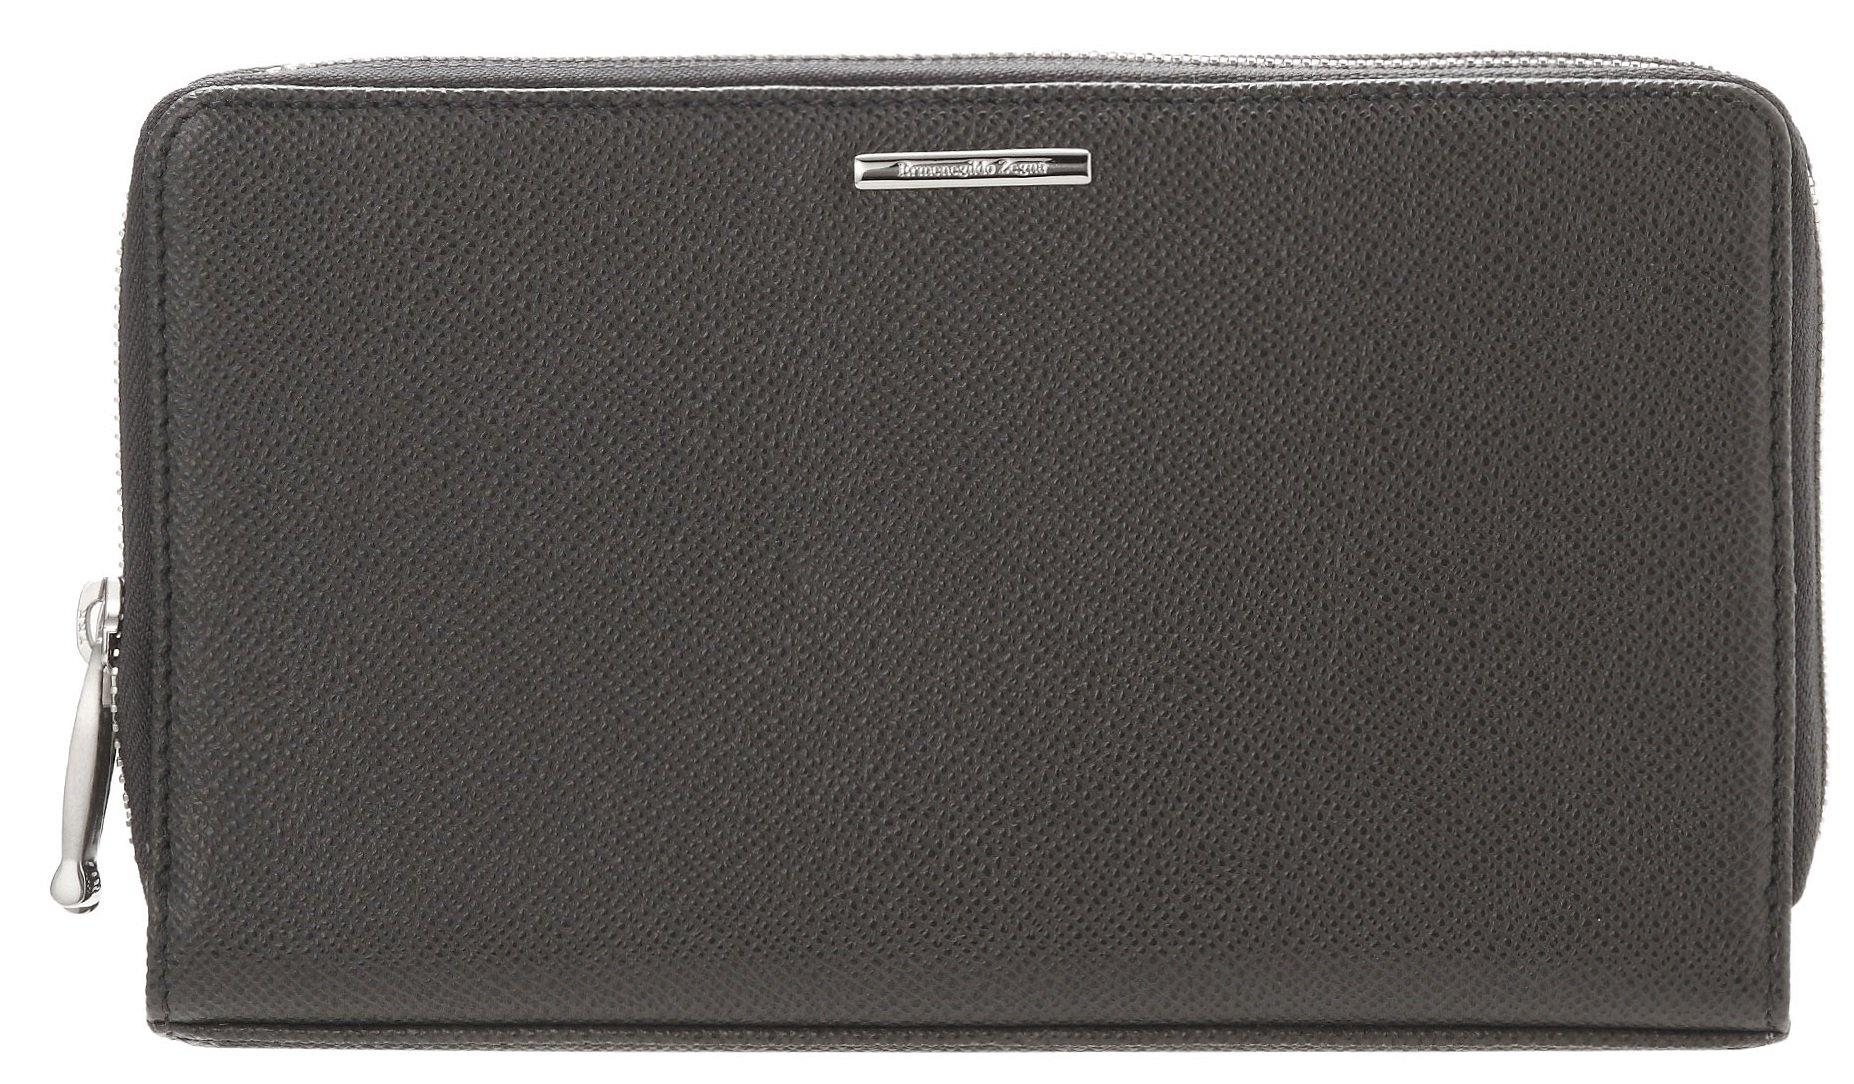 Ermenegildo Zegna Men's Grained Leather Travel Wallet (One Size, Grey)